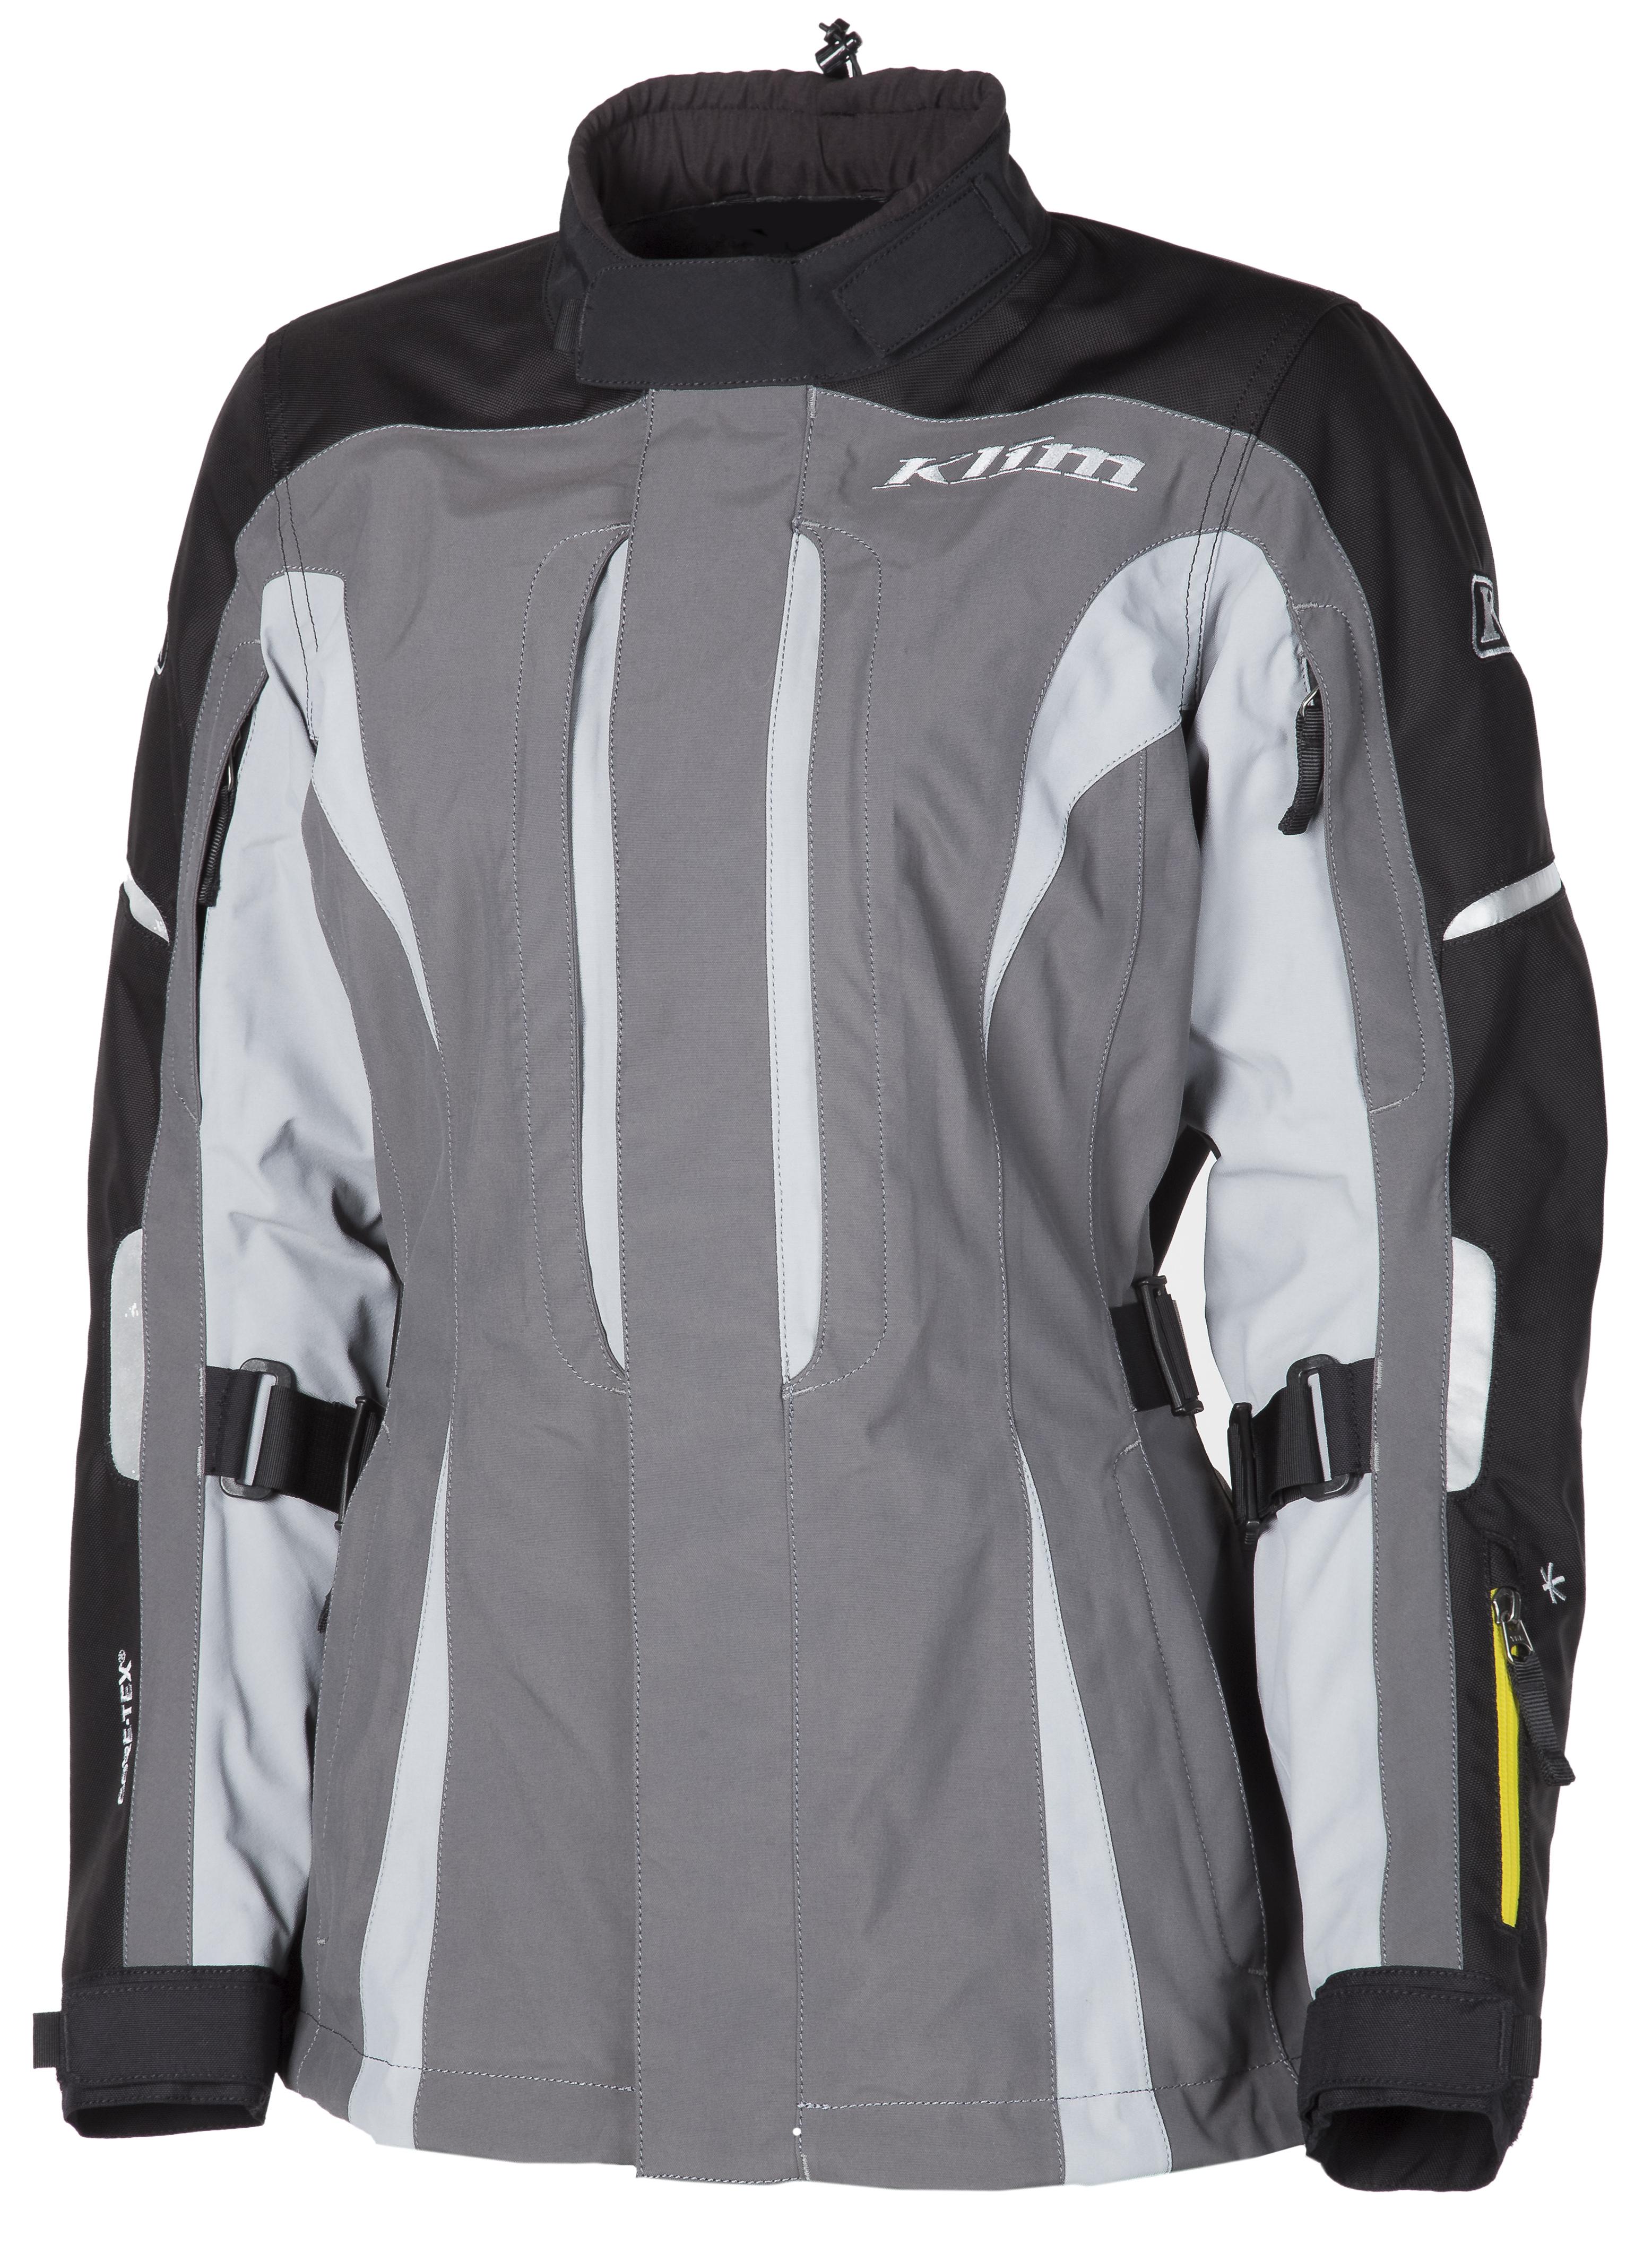 5093-001-600 Altitude Jacket